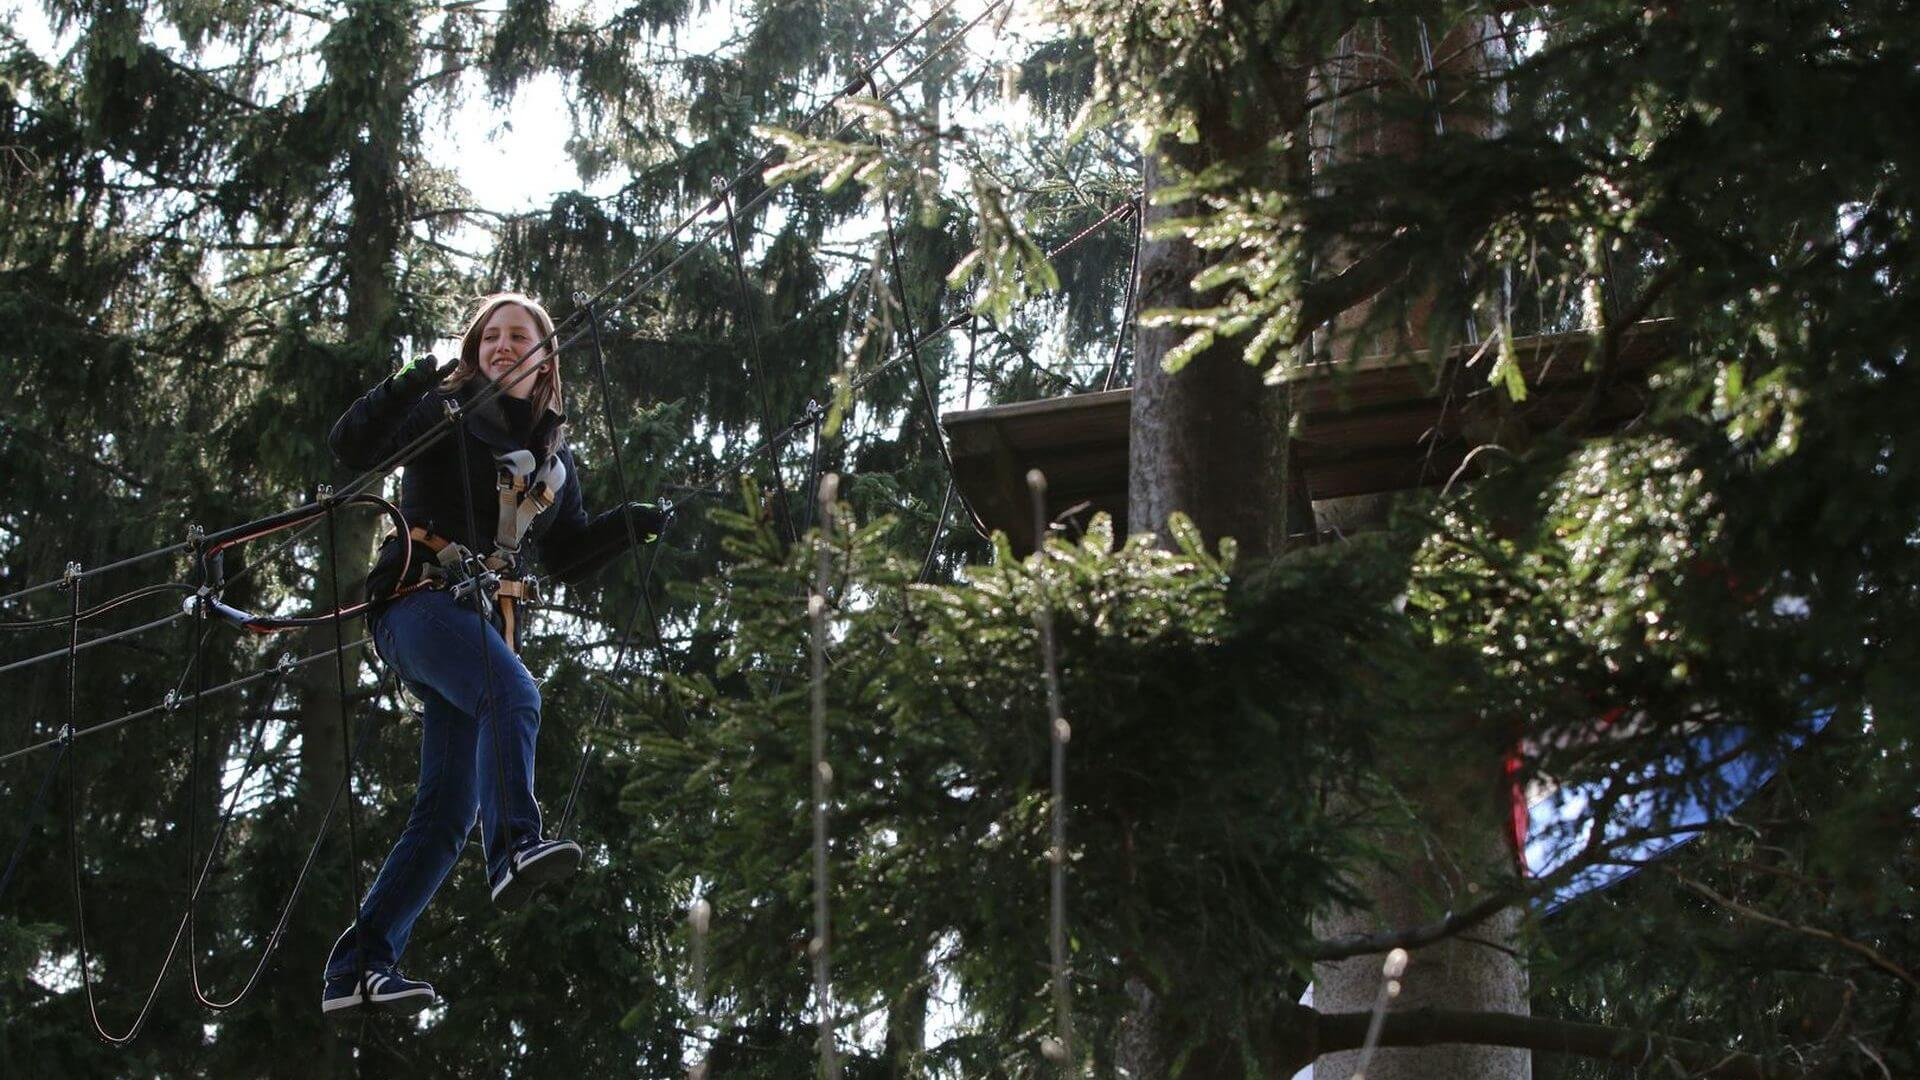 Freizeittipp Familie Kletterwald Winterberg am Erlebnisberg Kappe (6)